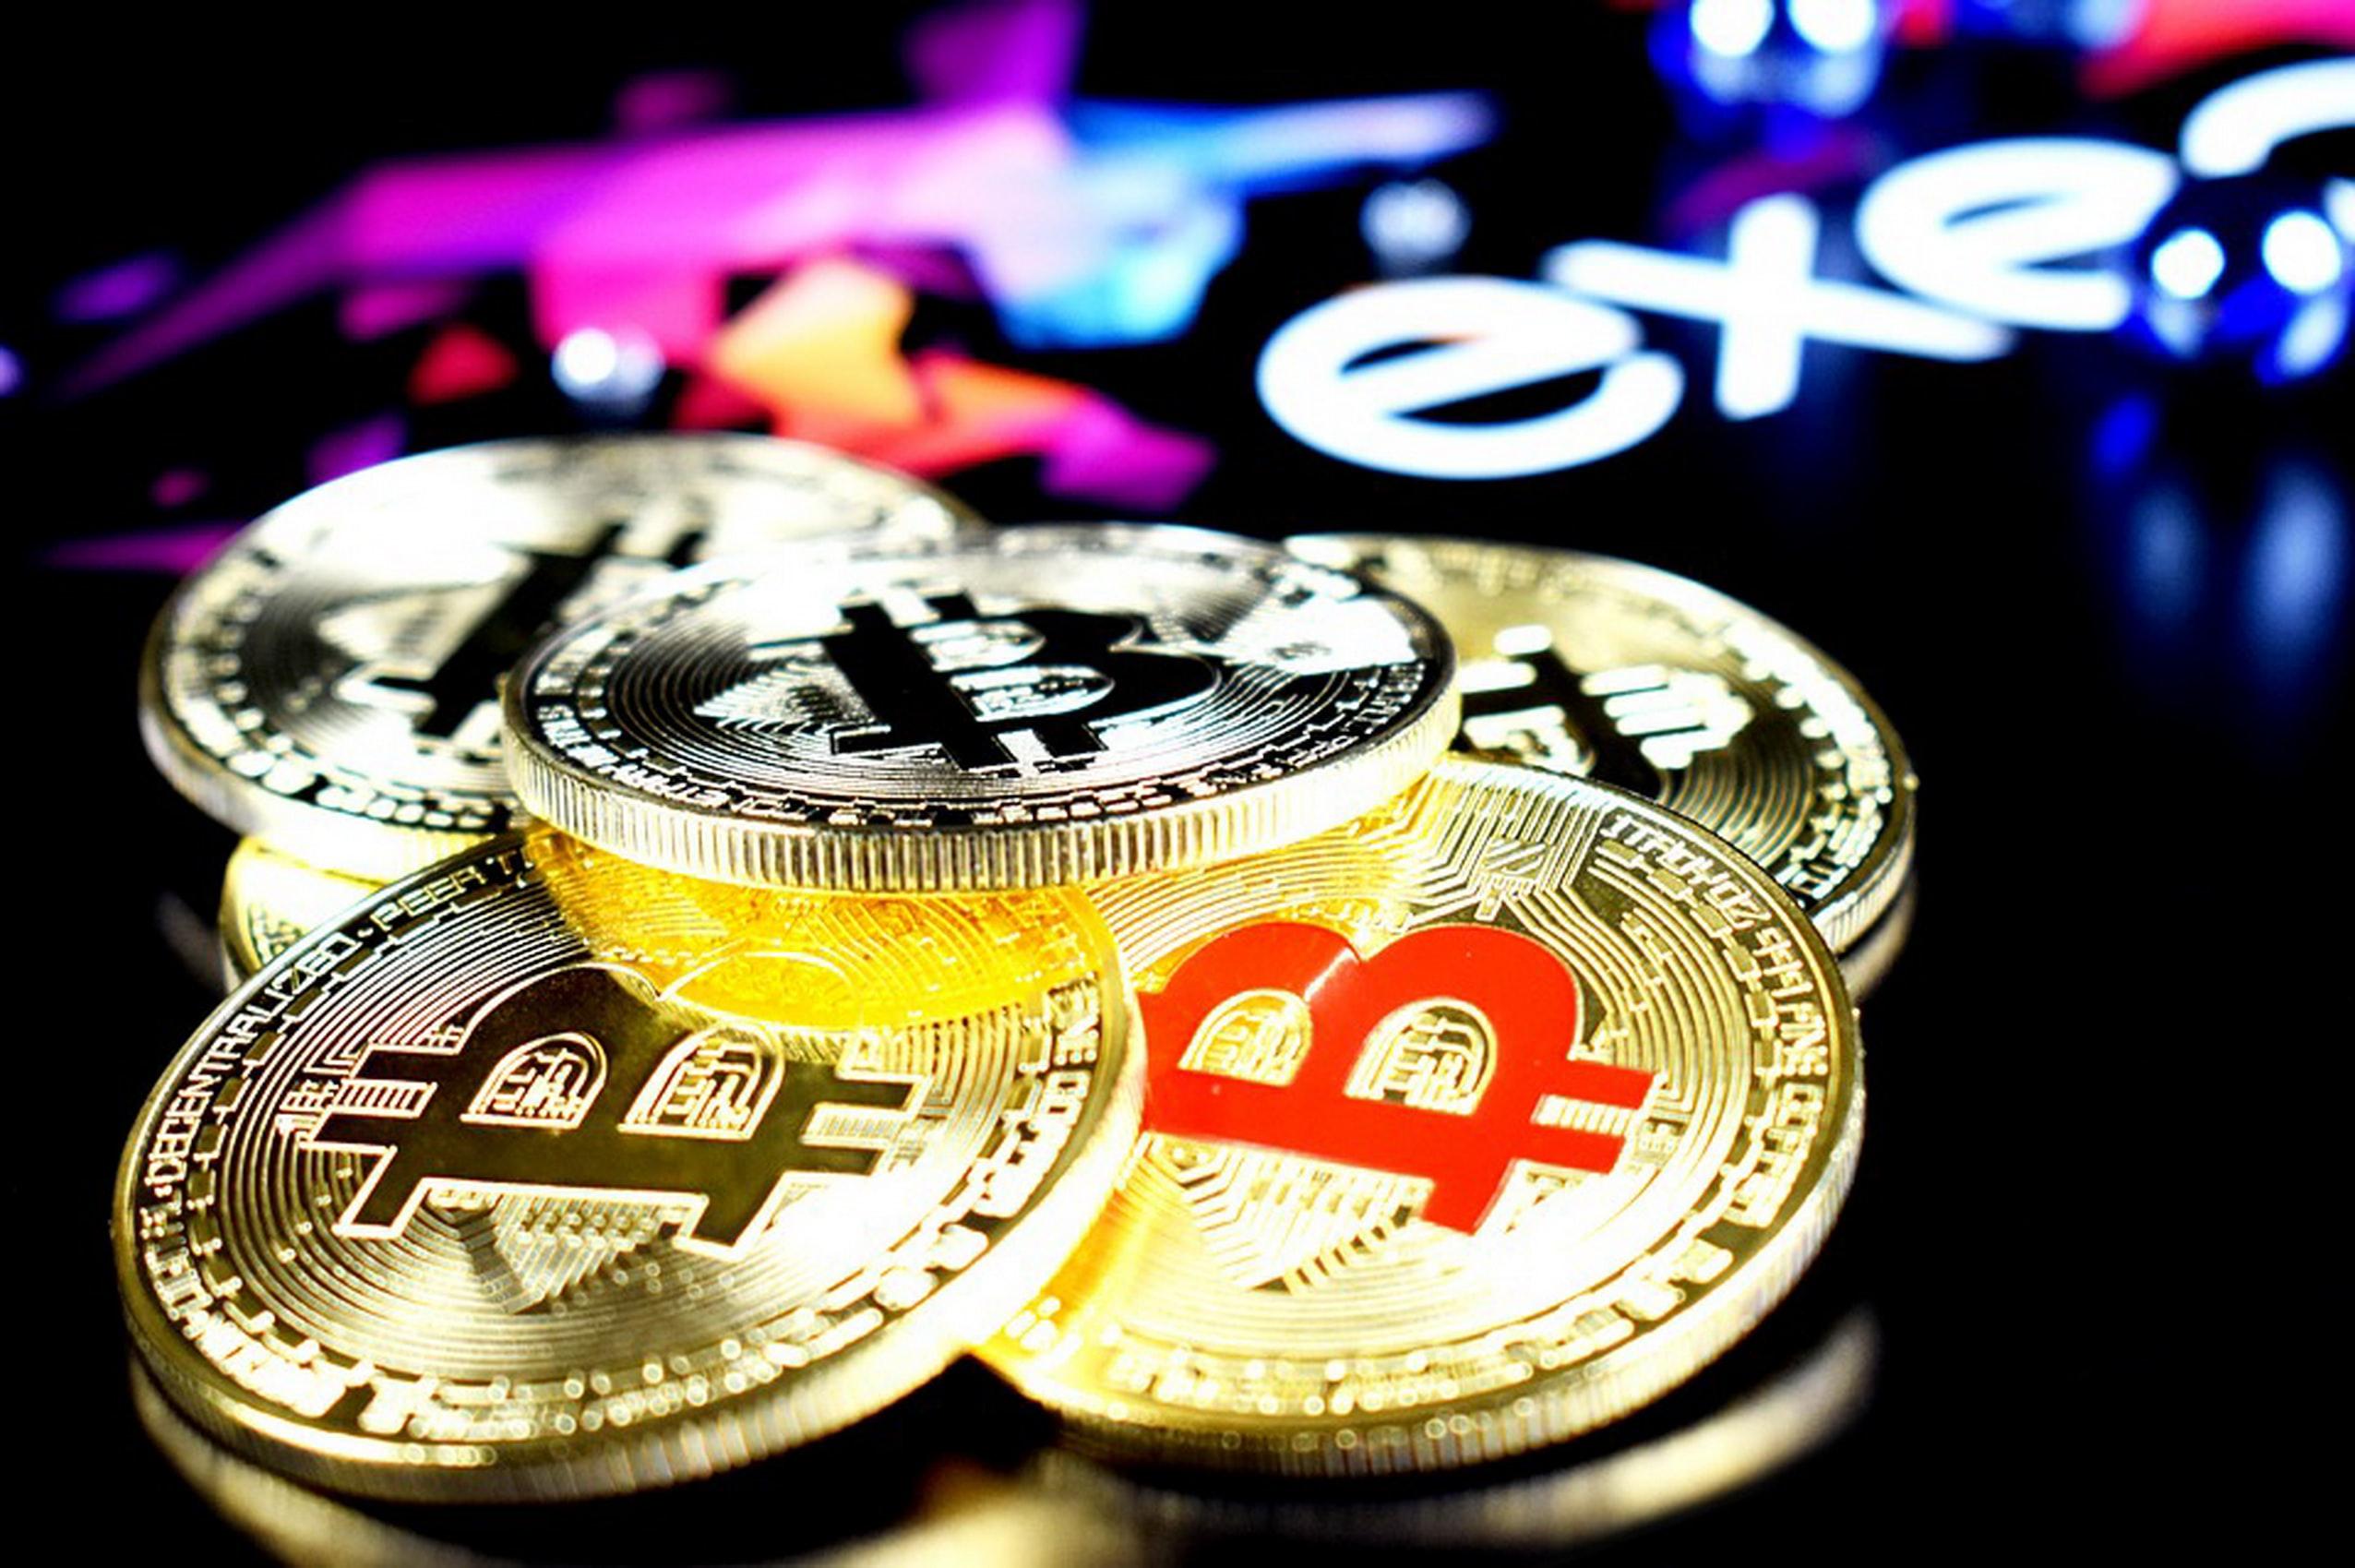 rendements sur vos cryptos